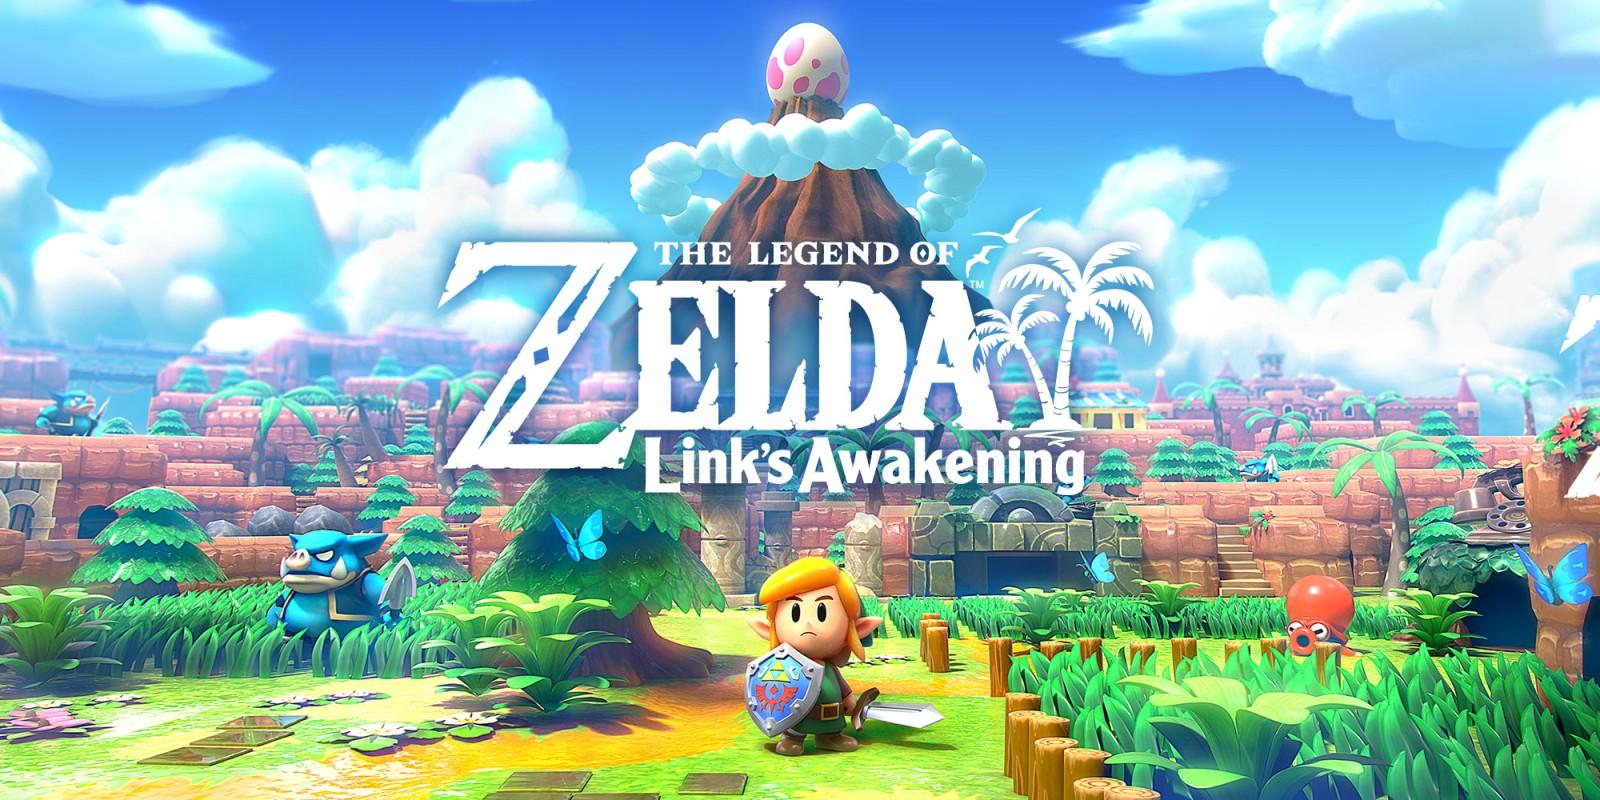 links awakening logo.jpg